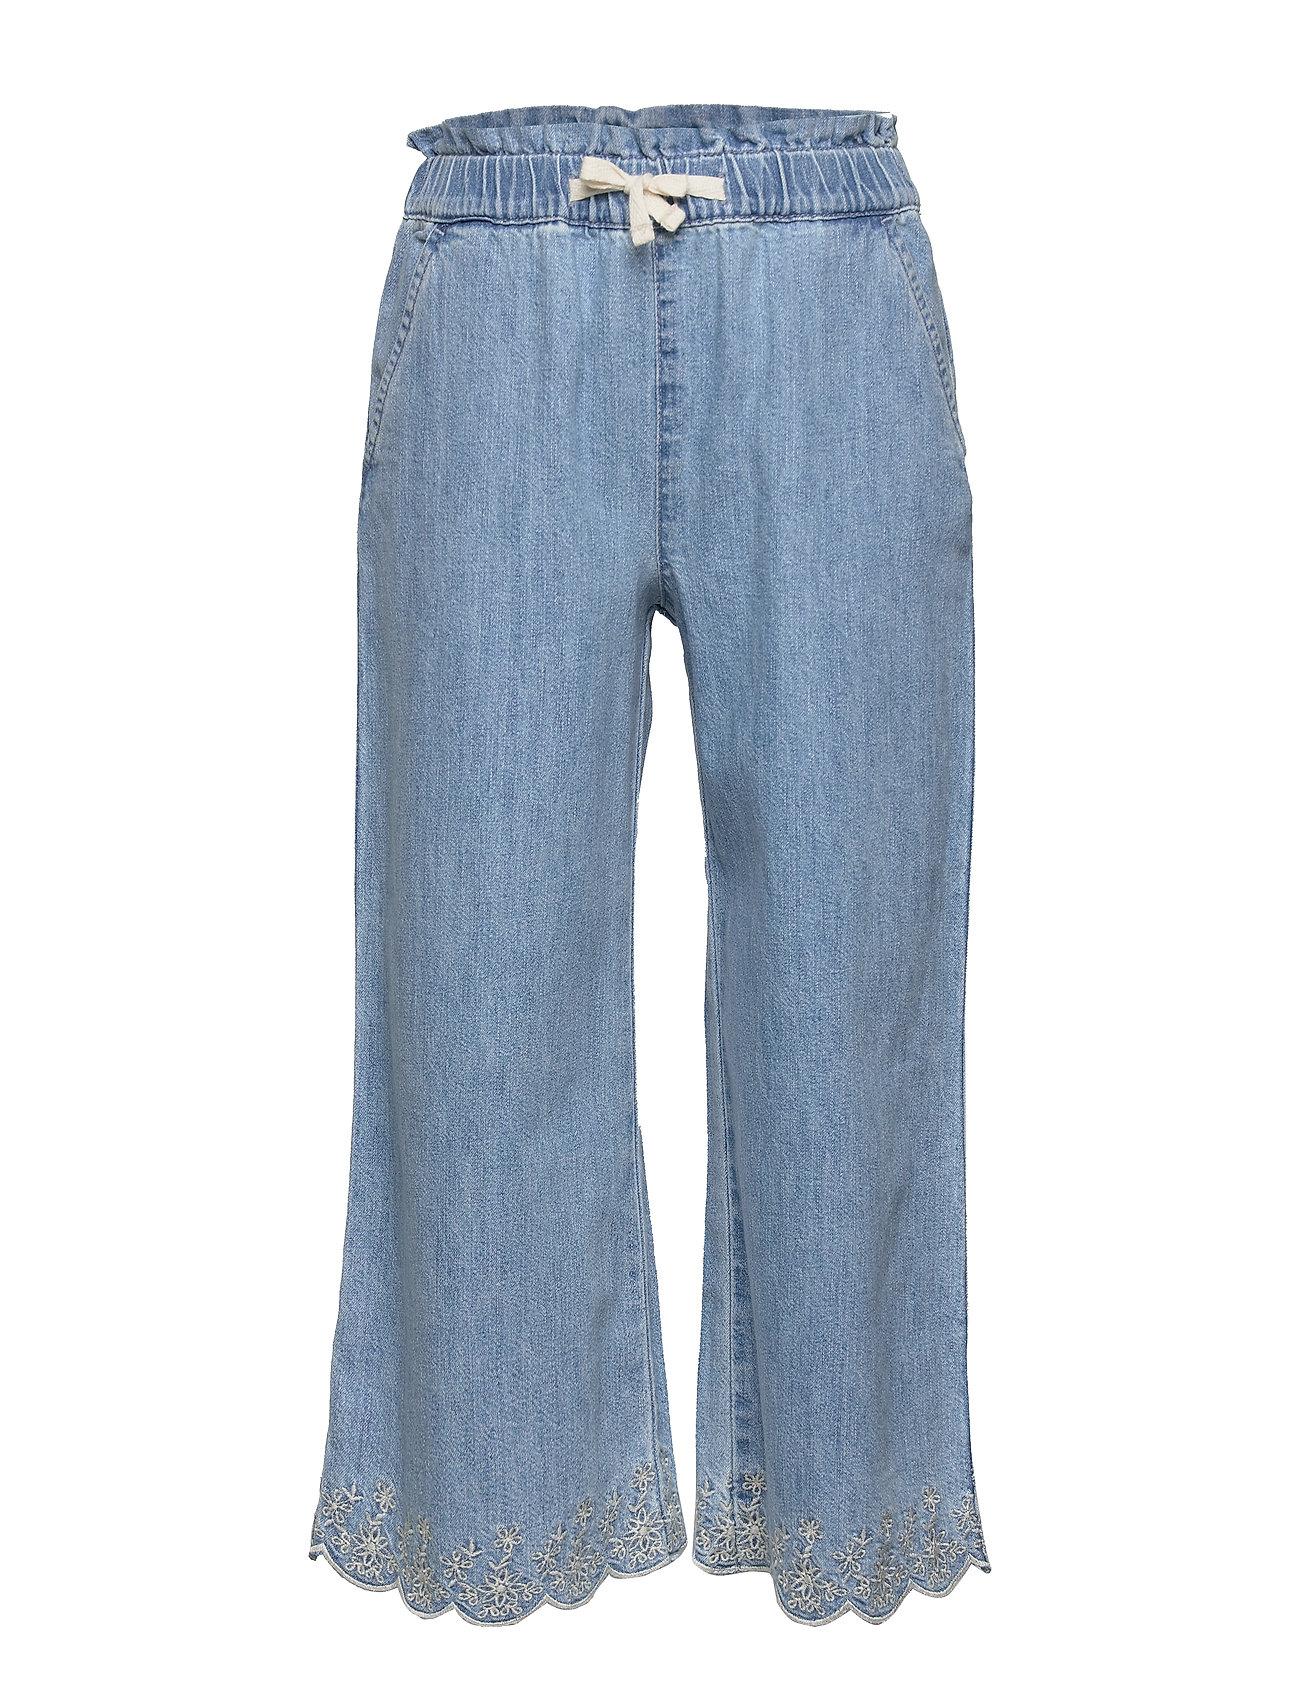 GAP Kids Eyelet Chambray Wide-Leg Crop Pants - INDIGO CHAMBRAY